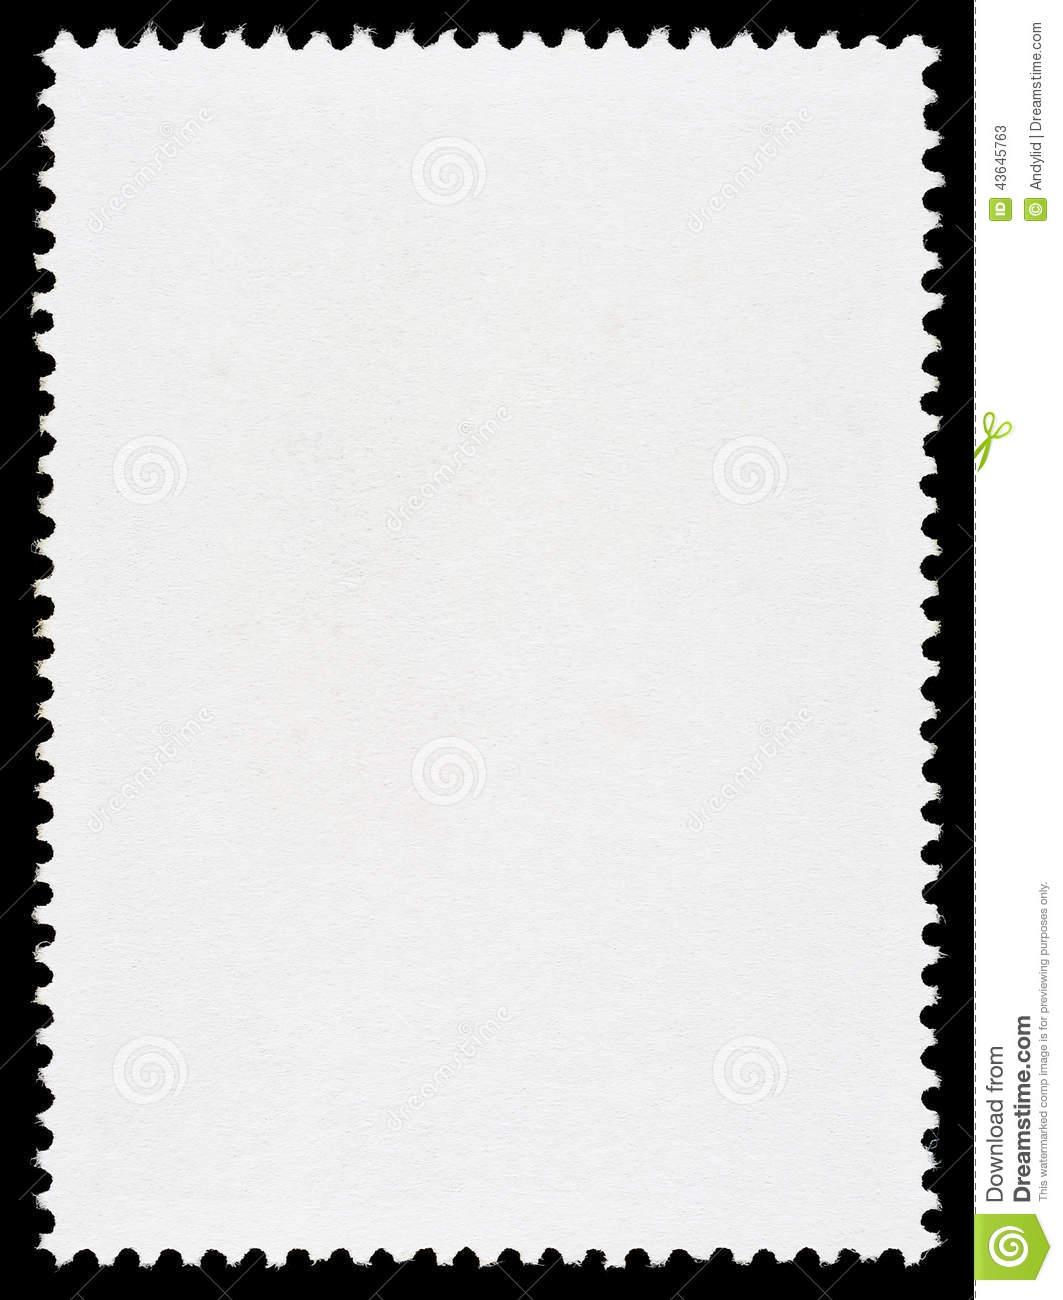 blank postage stamp clipart clipart suggest. Black Bedroom Furniture Sets. Home Design Ideas